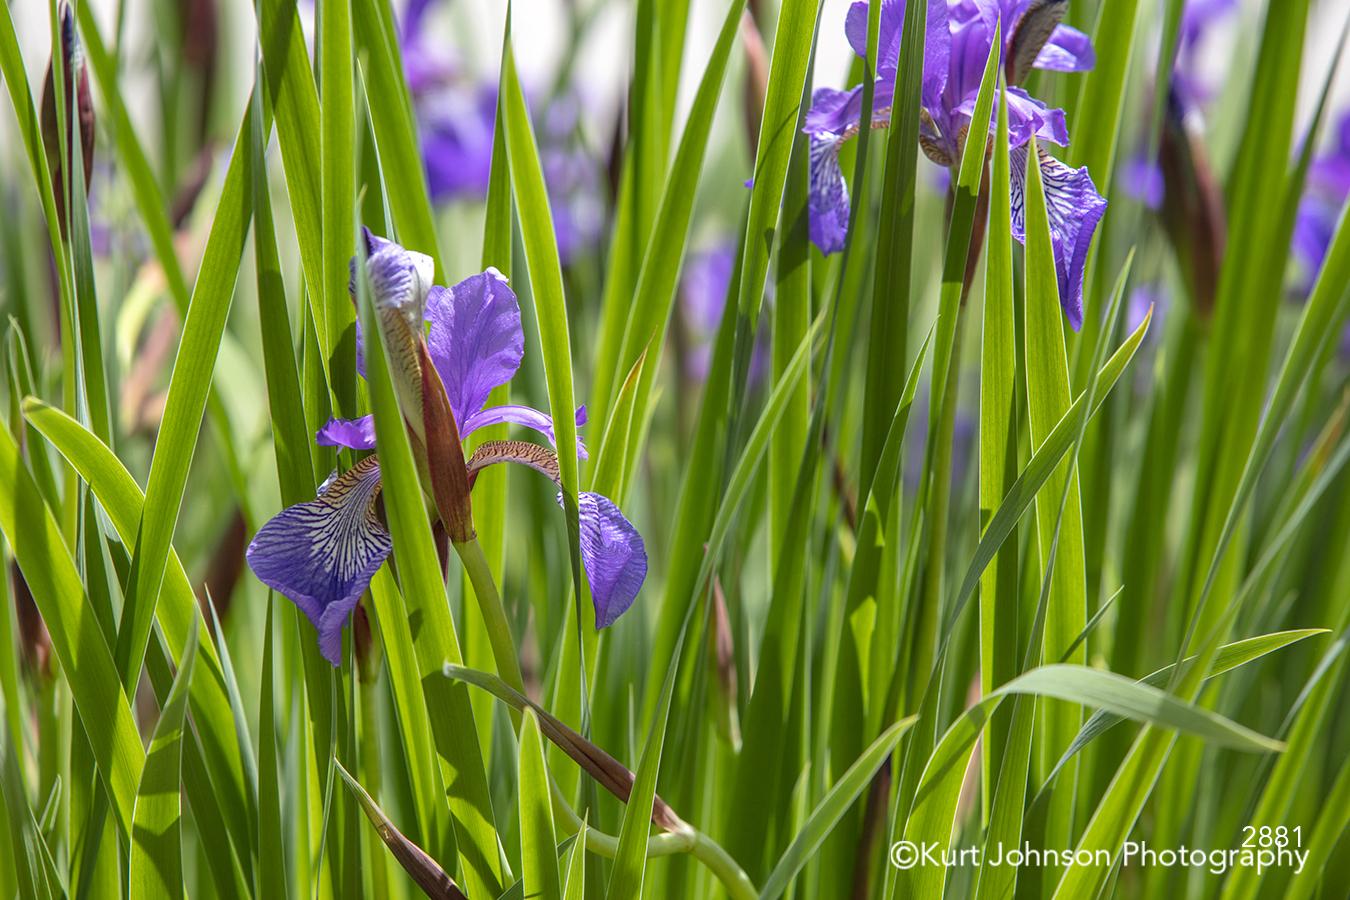 green grass grasses purple flower spring flowers iris field meadow